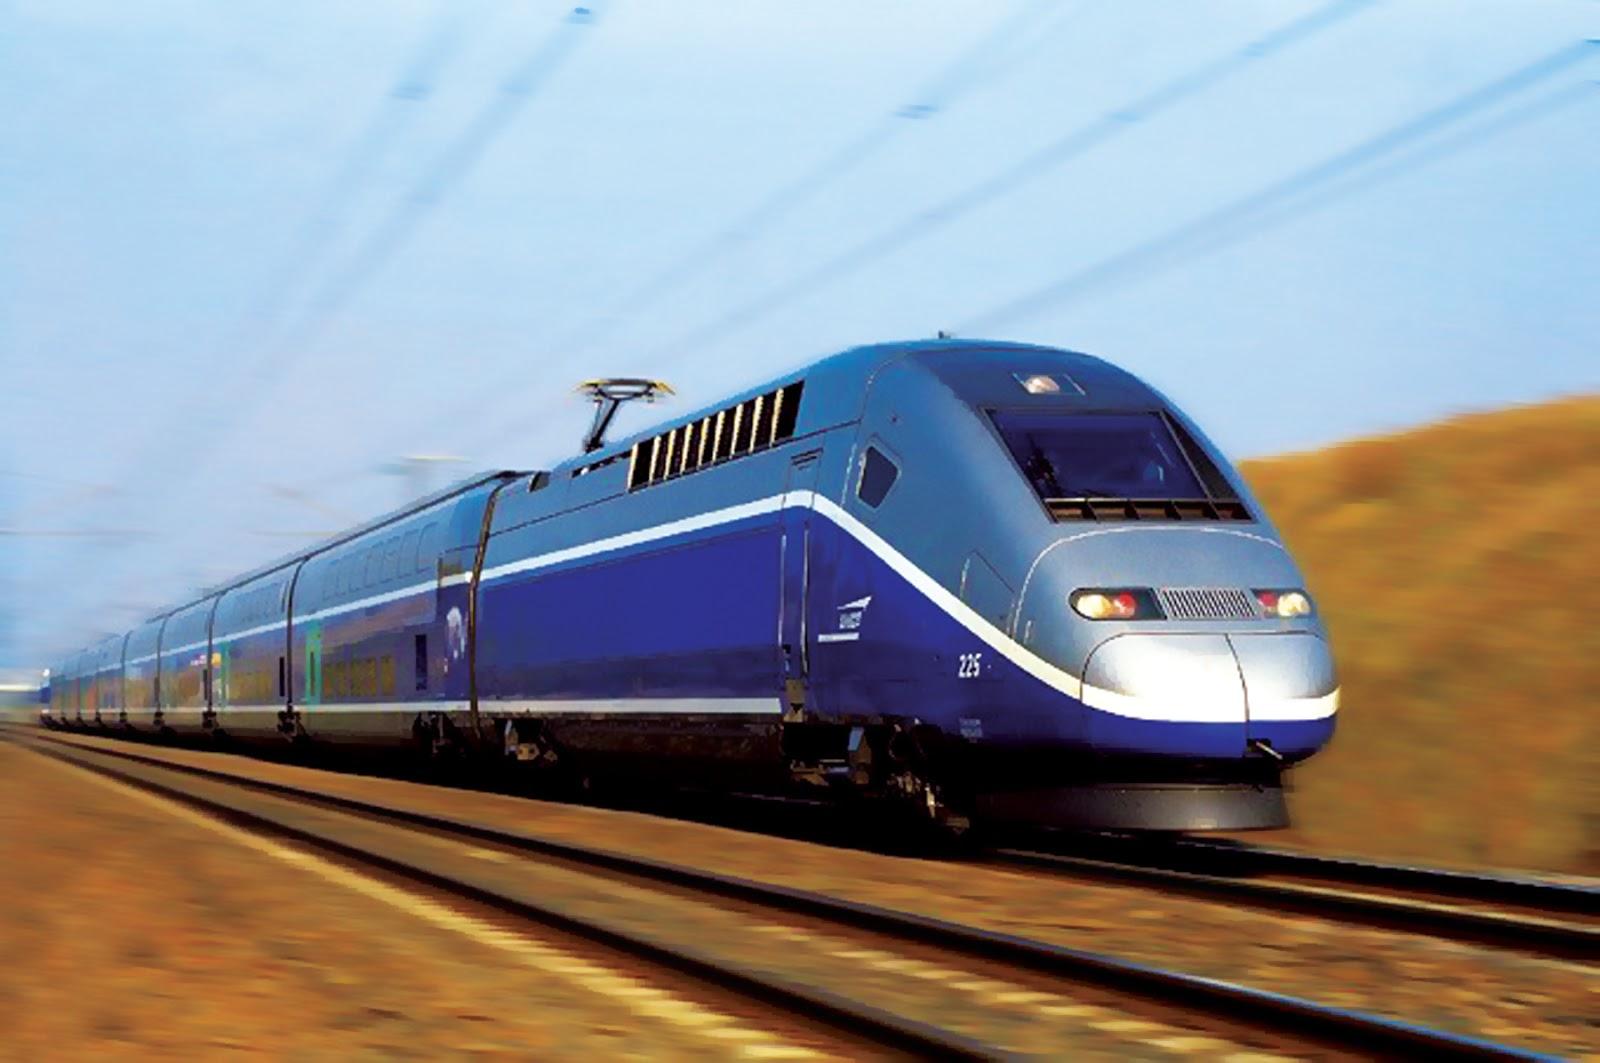 maglev train image1